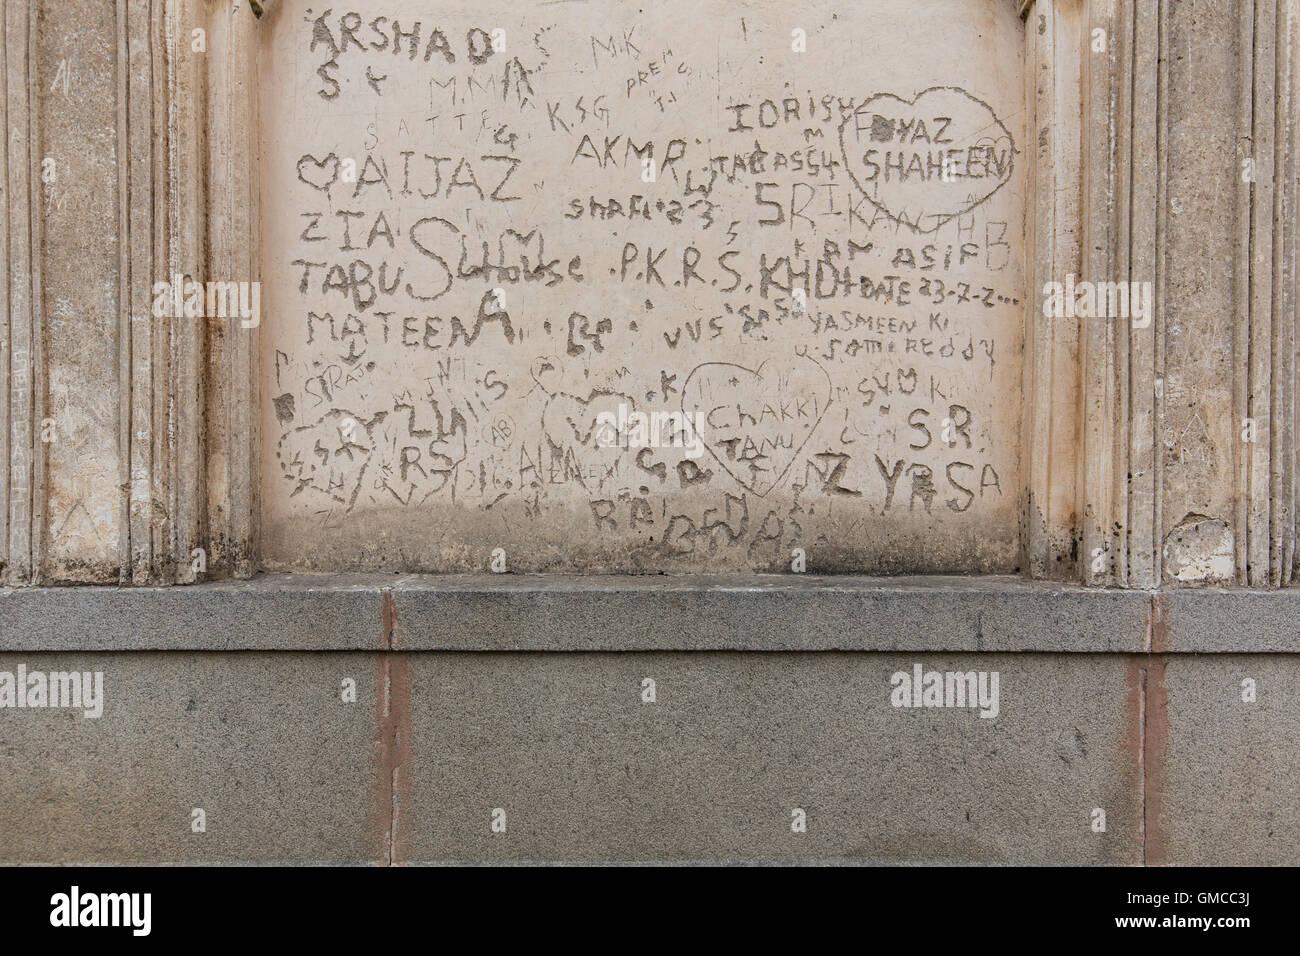 Writings on the wall of Qutub Shahi Tombs - Stock Image